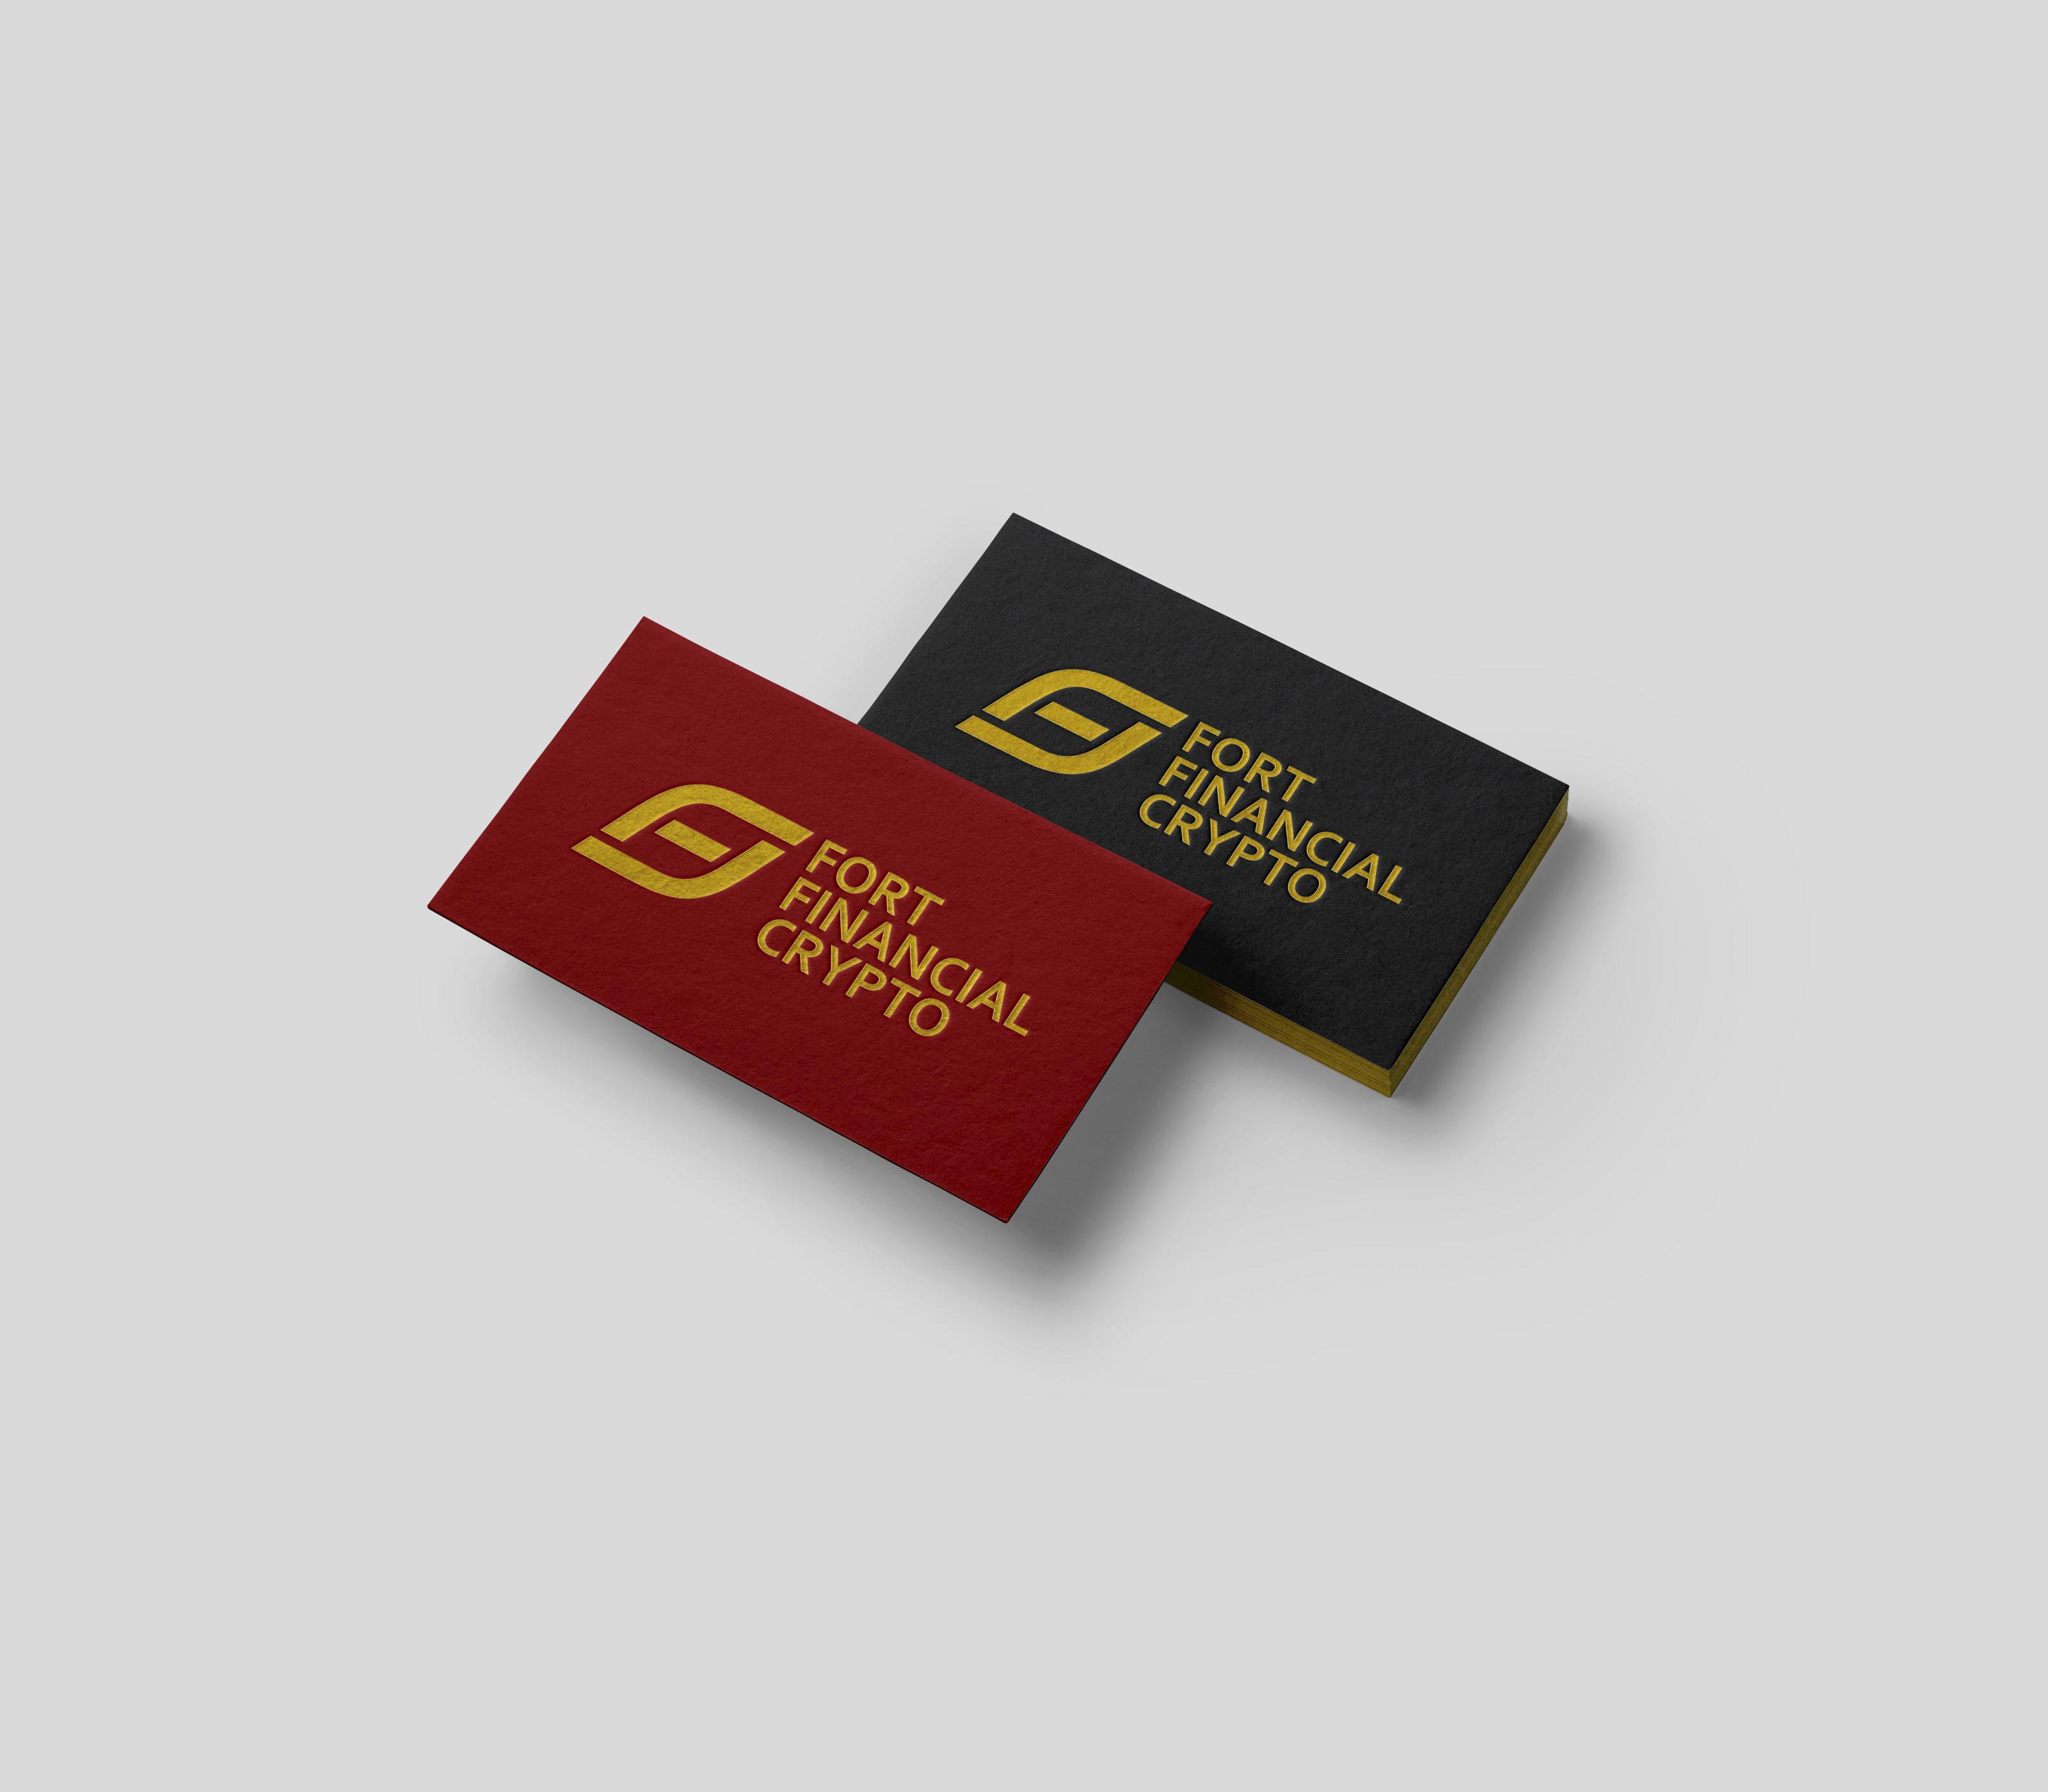 Разработка логотипа финансовой компании фото f_1565a91cd4004243.jpg